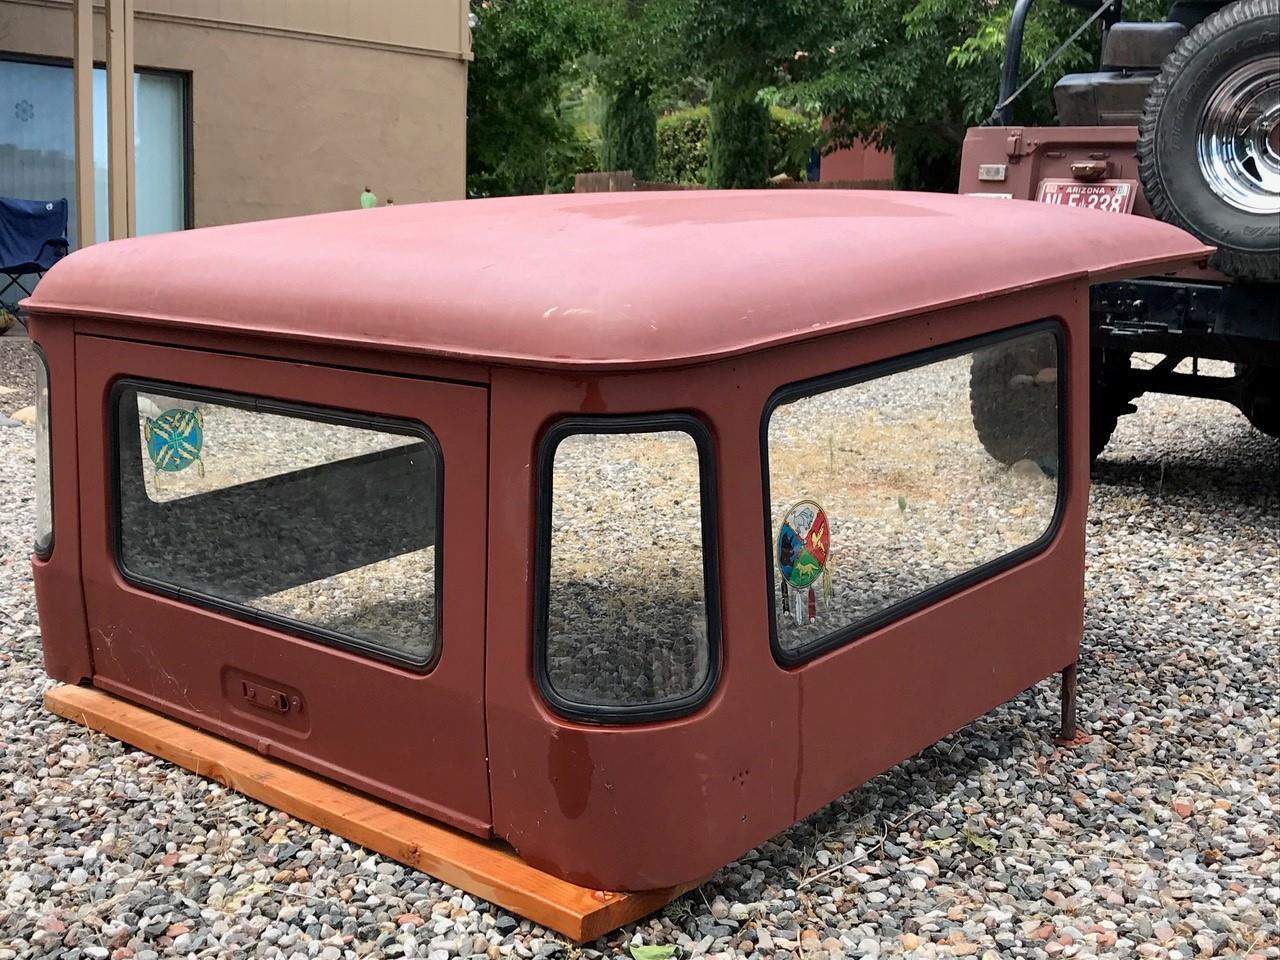 1969 Toyota Land Cruiser FJ40 (CC-1418089) for sale in Sedona, Arizona